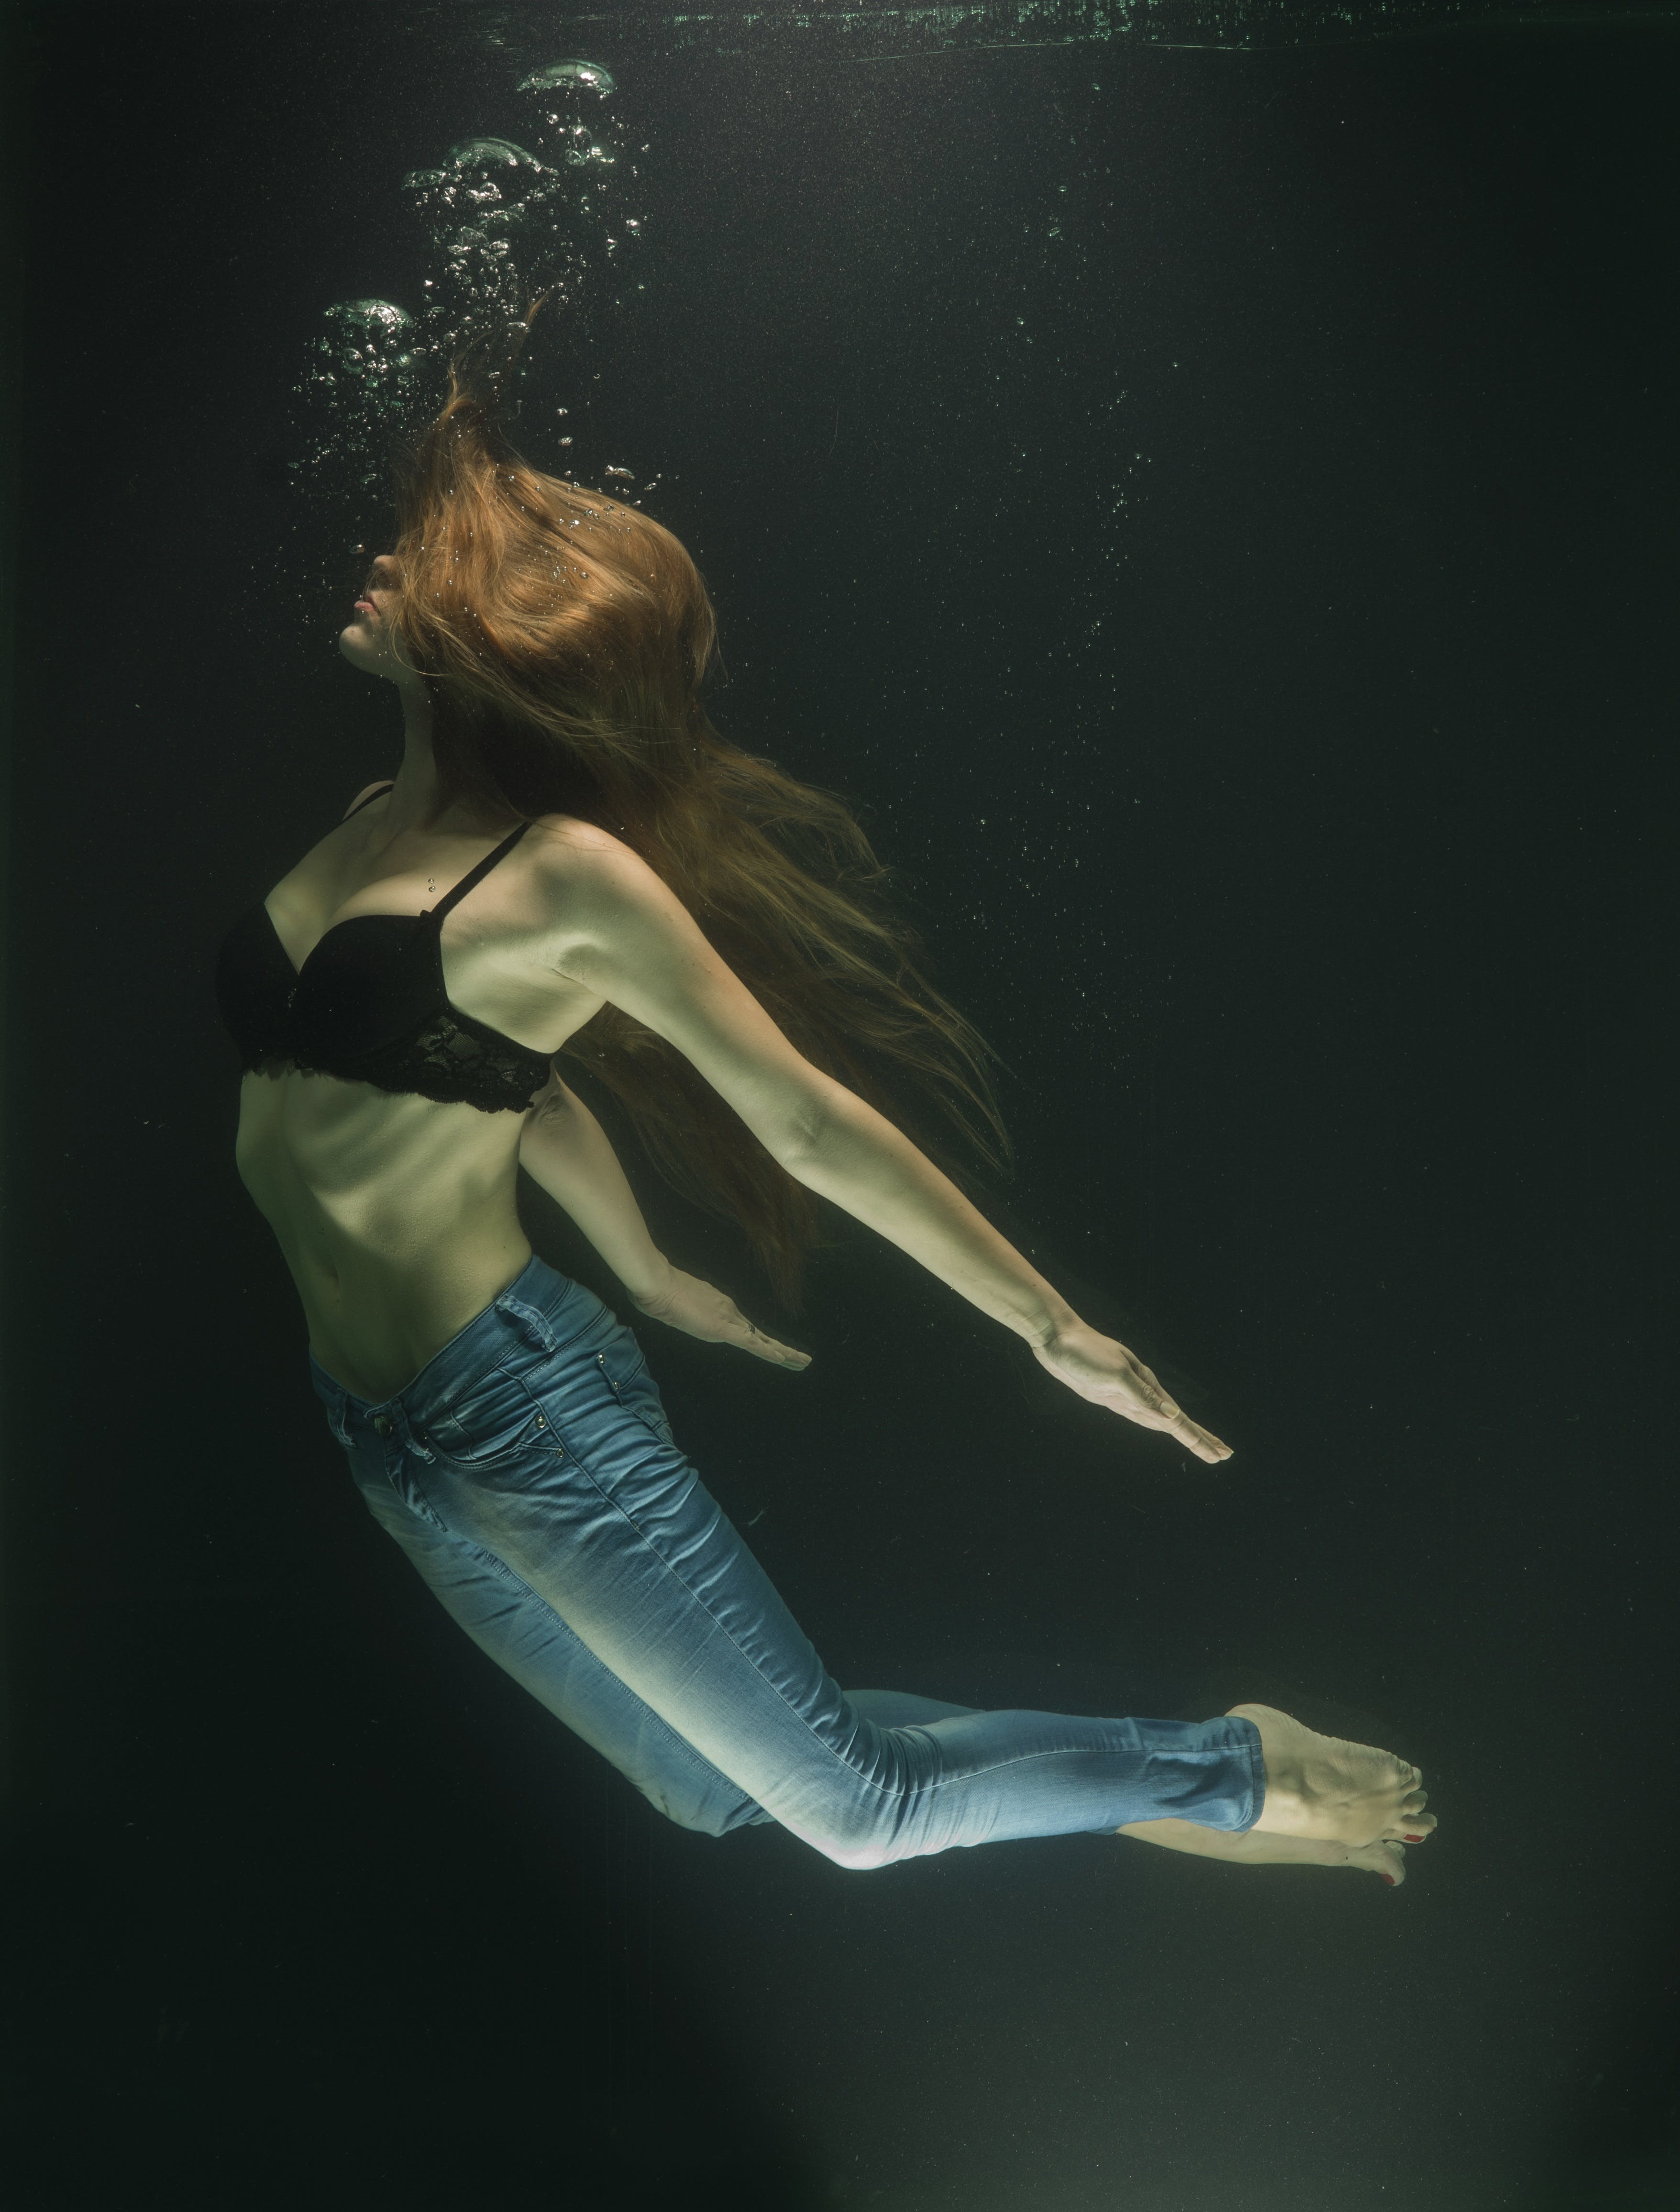 Free stock photo of fashion, art, water, model